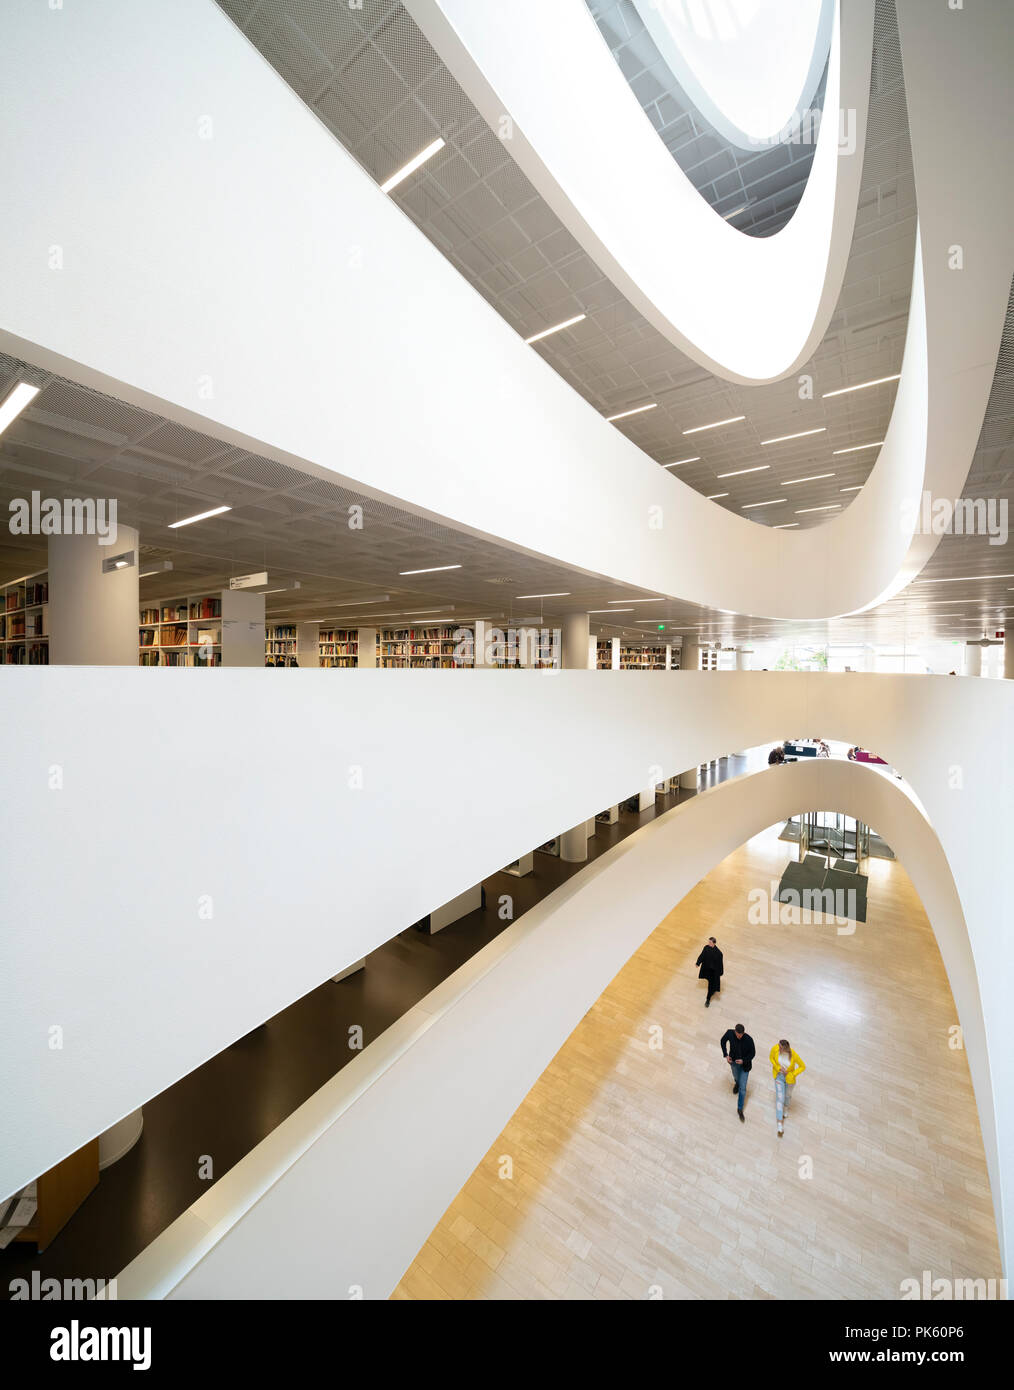 https://c7.alamy.com/comp/PK60P6/kaisa-house-helsinki-university-main-library-helsingin-yliopiston-pkirjasto-helsinki-finland-PK60P6.jpg